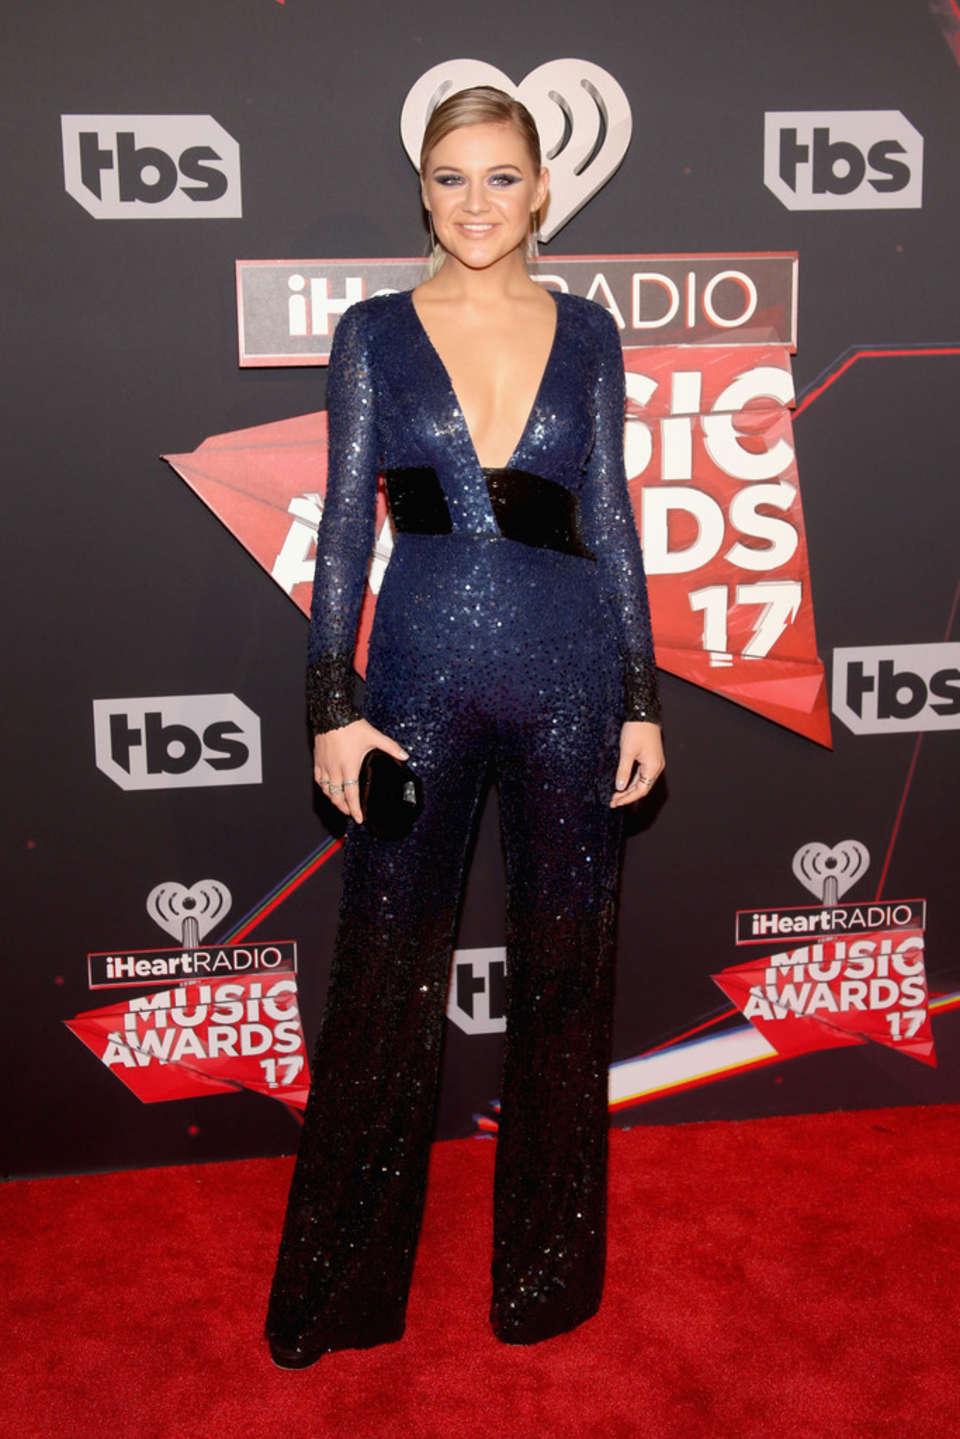 Kelsea Ballerini - 2017 iHeartRadio Music Awards in Los Angeles